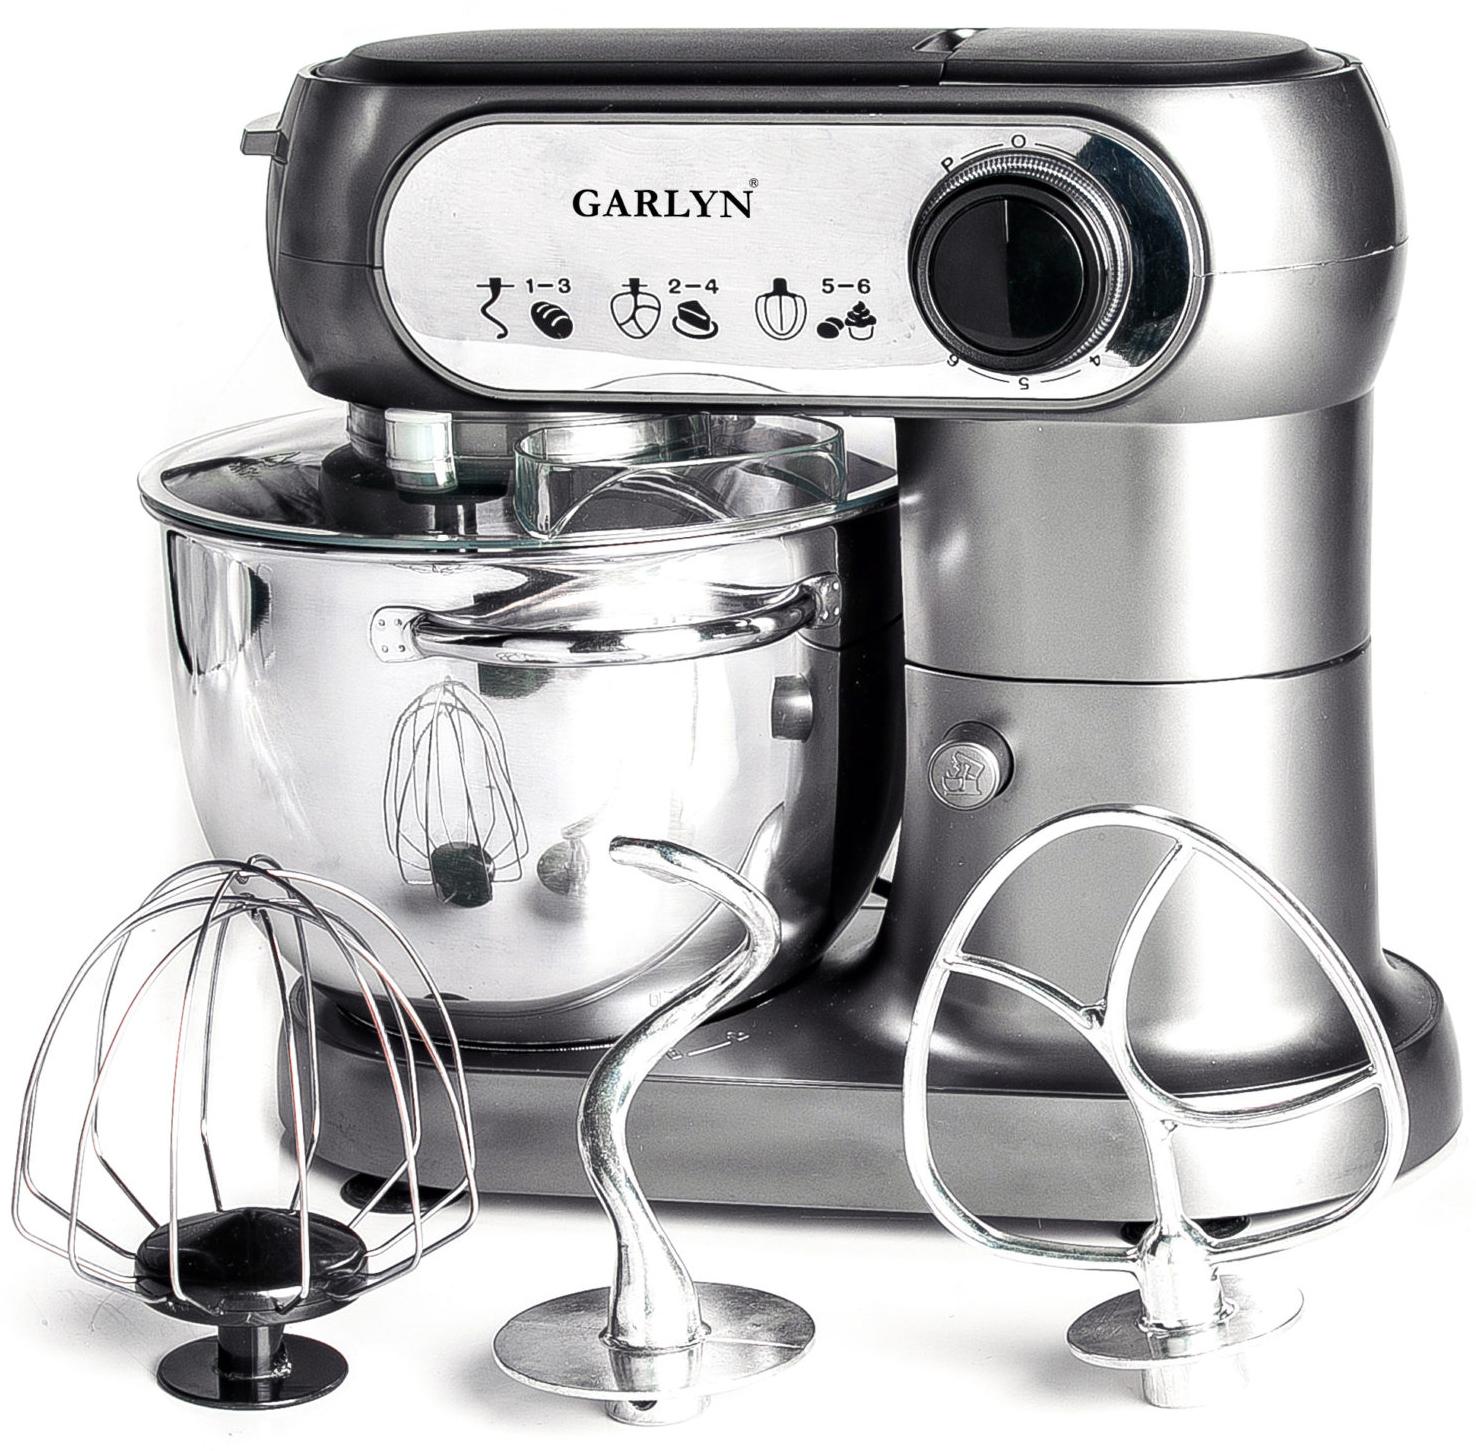 Кухонная машина Garlyn S-350 (Steel) фото